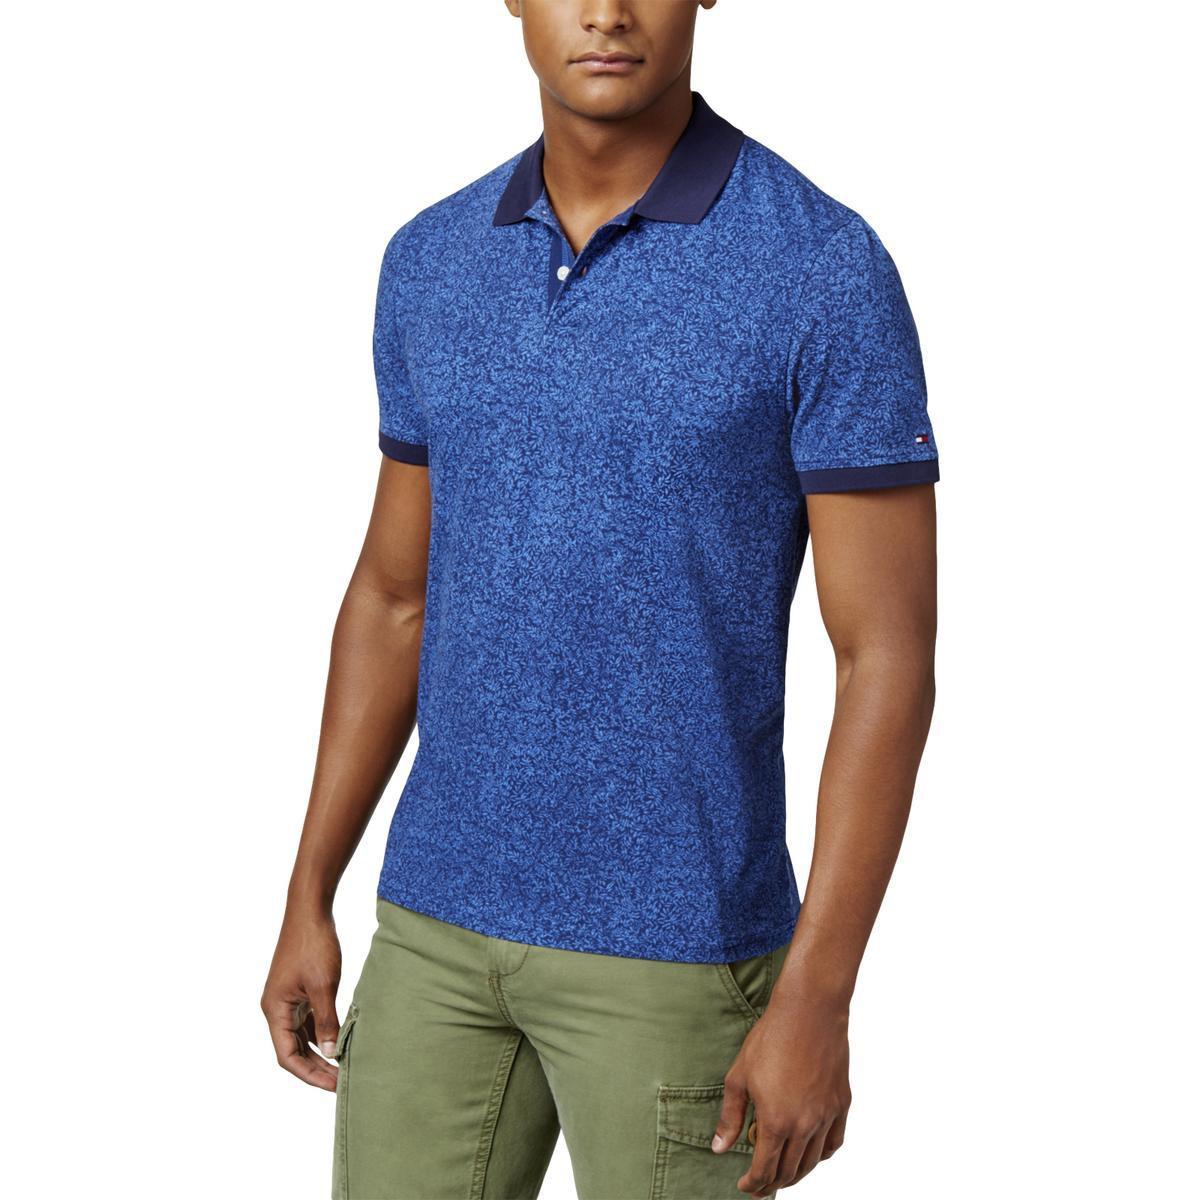 6cda8b3e Lyst - Tommy Hilfiger Custom Fit Short Sleeve Polo Shirt in Blue for Men